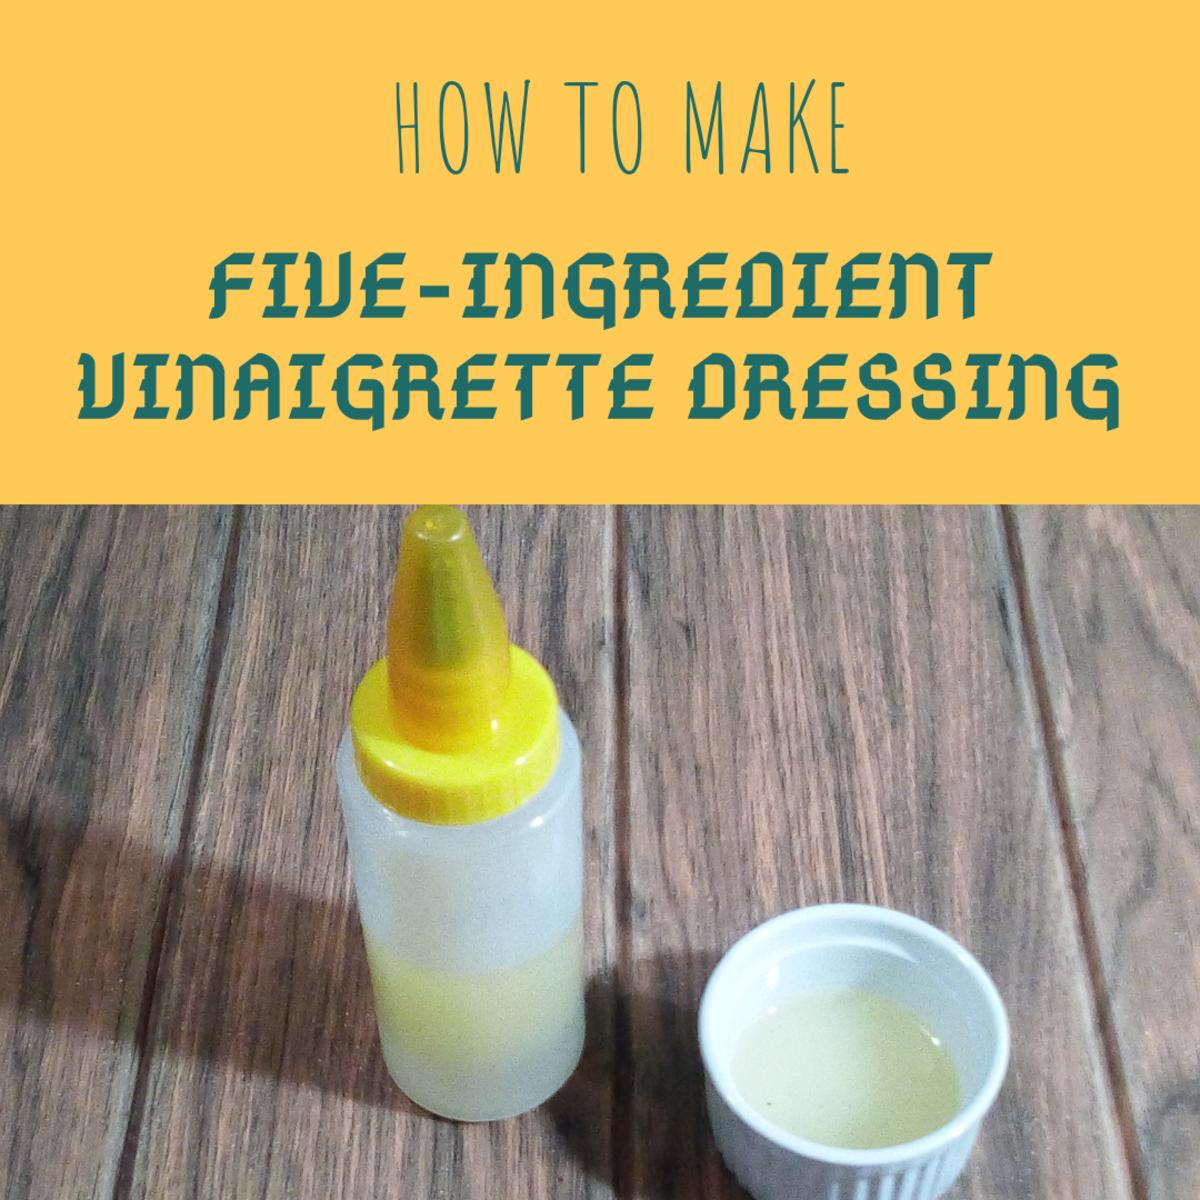 How to Make Five-Ingredient Vinaigrette Dressing